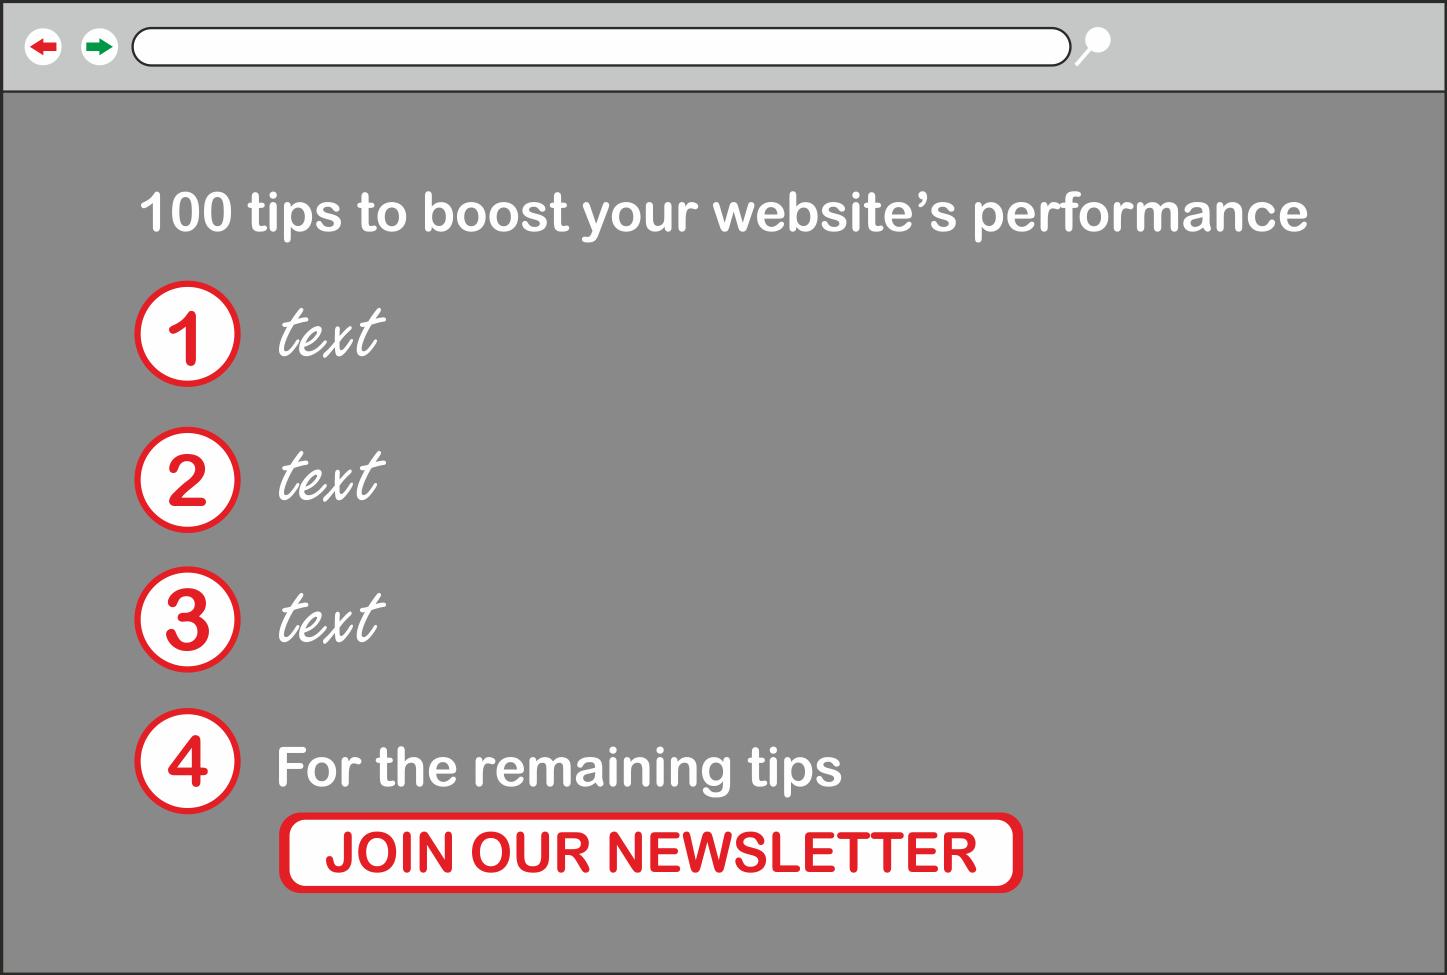 5 идей по улучшению UX на сайте за 2 часа